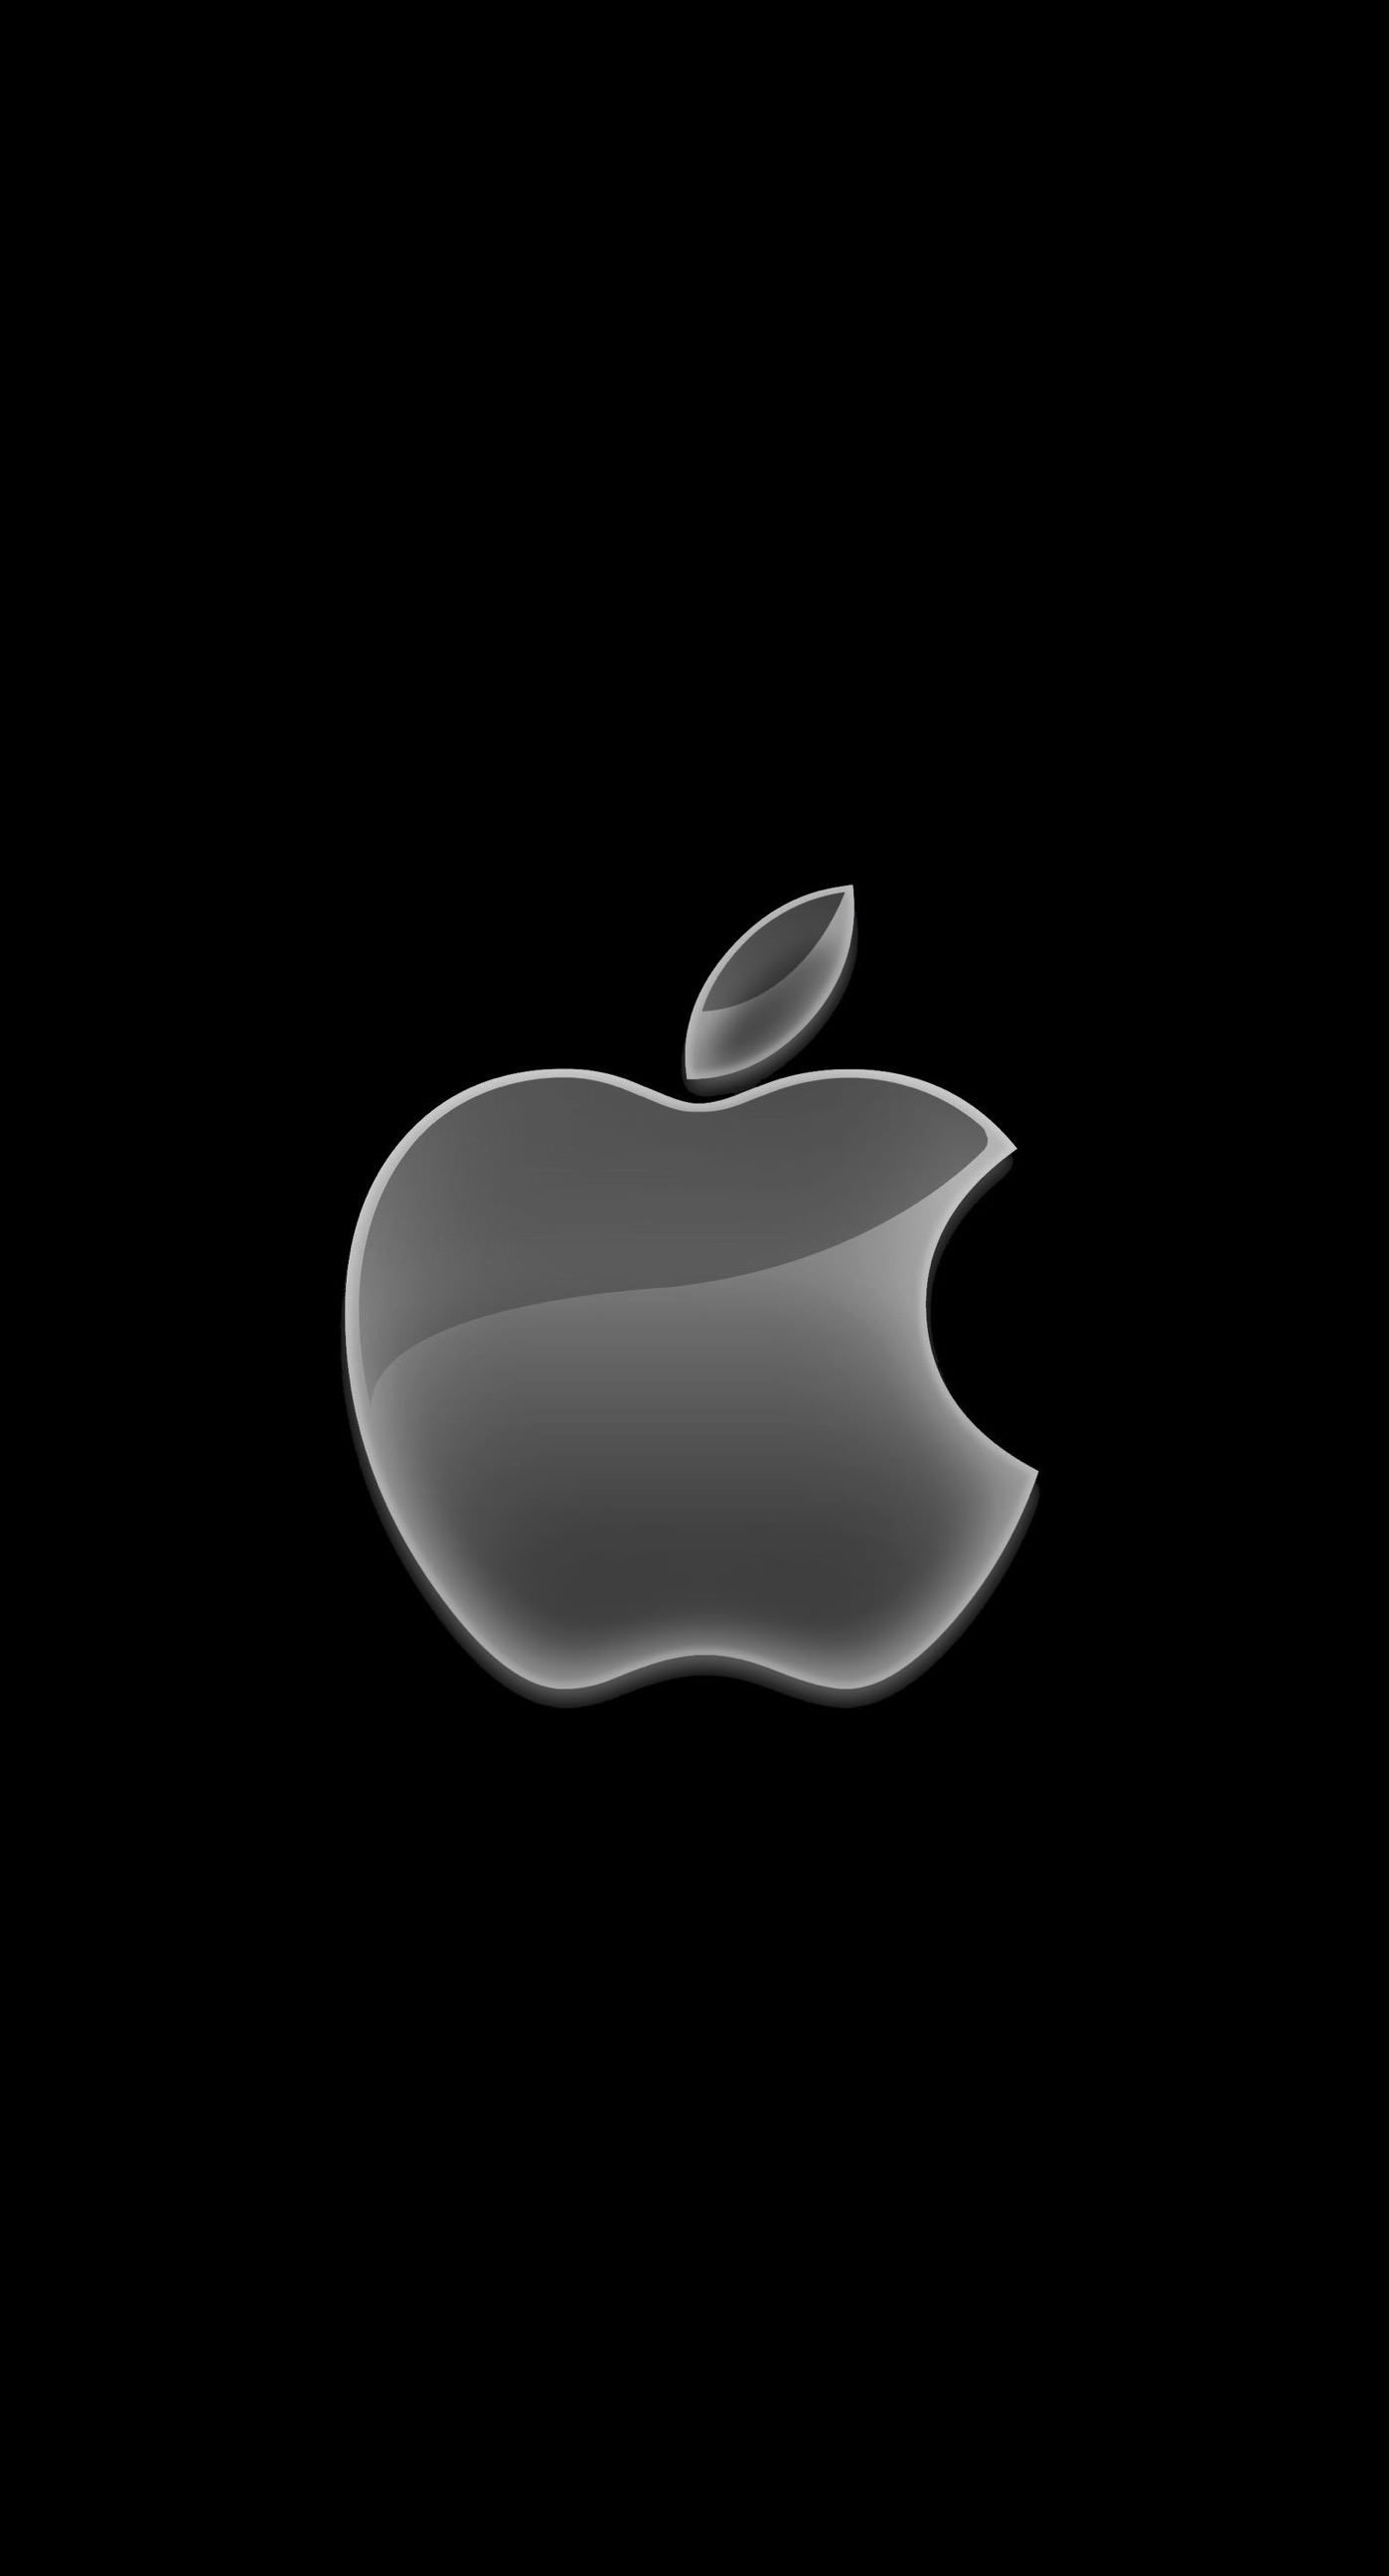 Apple Logo Apple Logo Wallpaper Iphone Black Apple Wallpaper Apple Logo Wallpaper